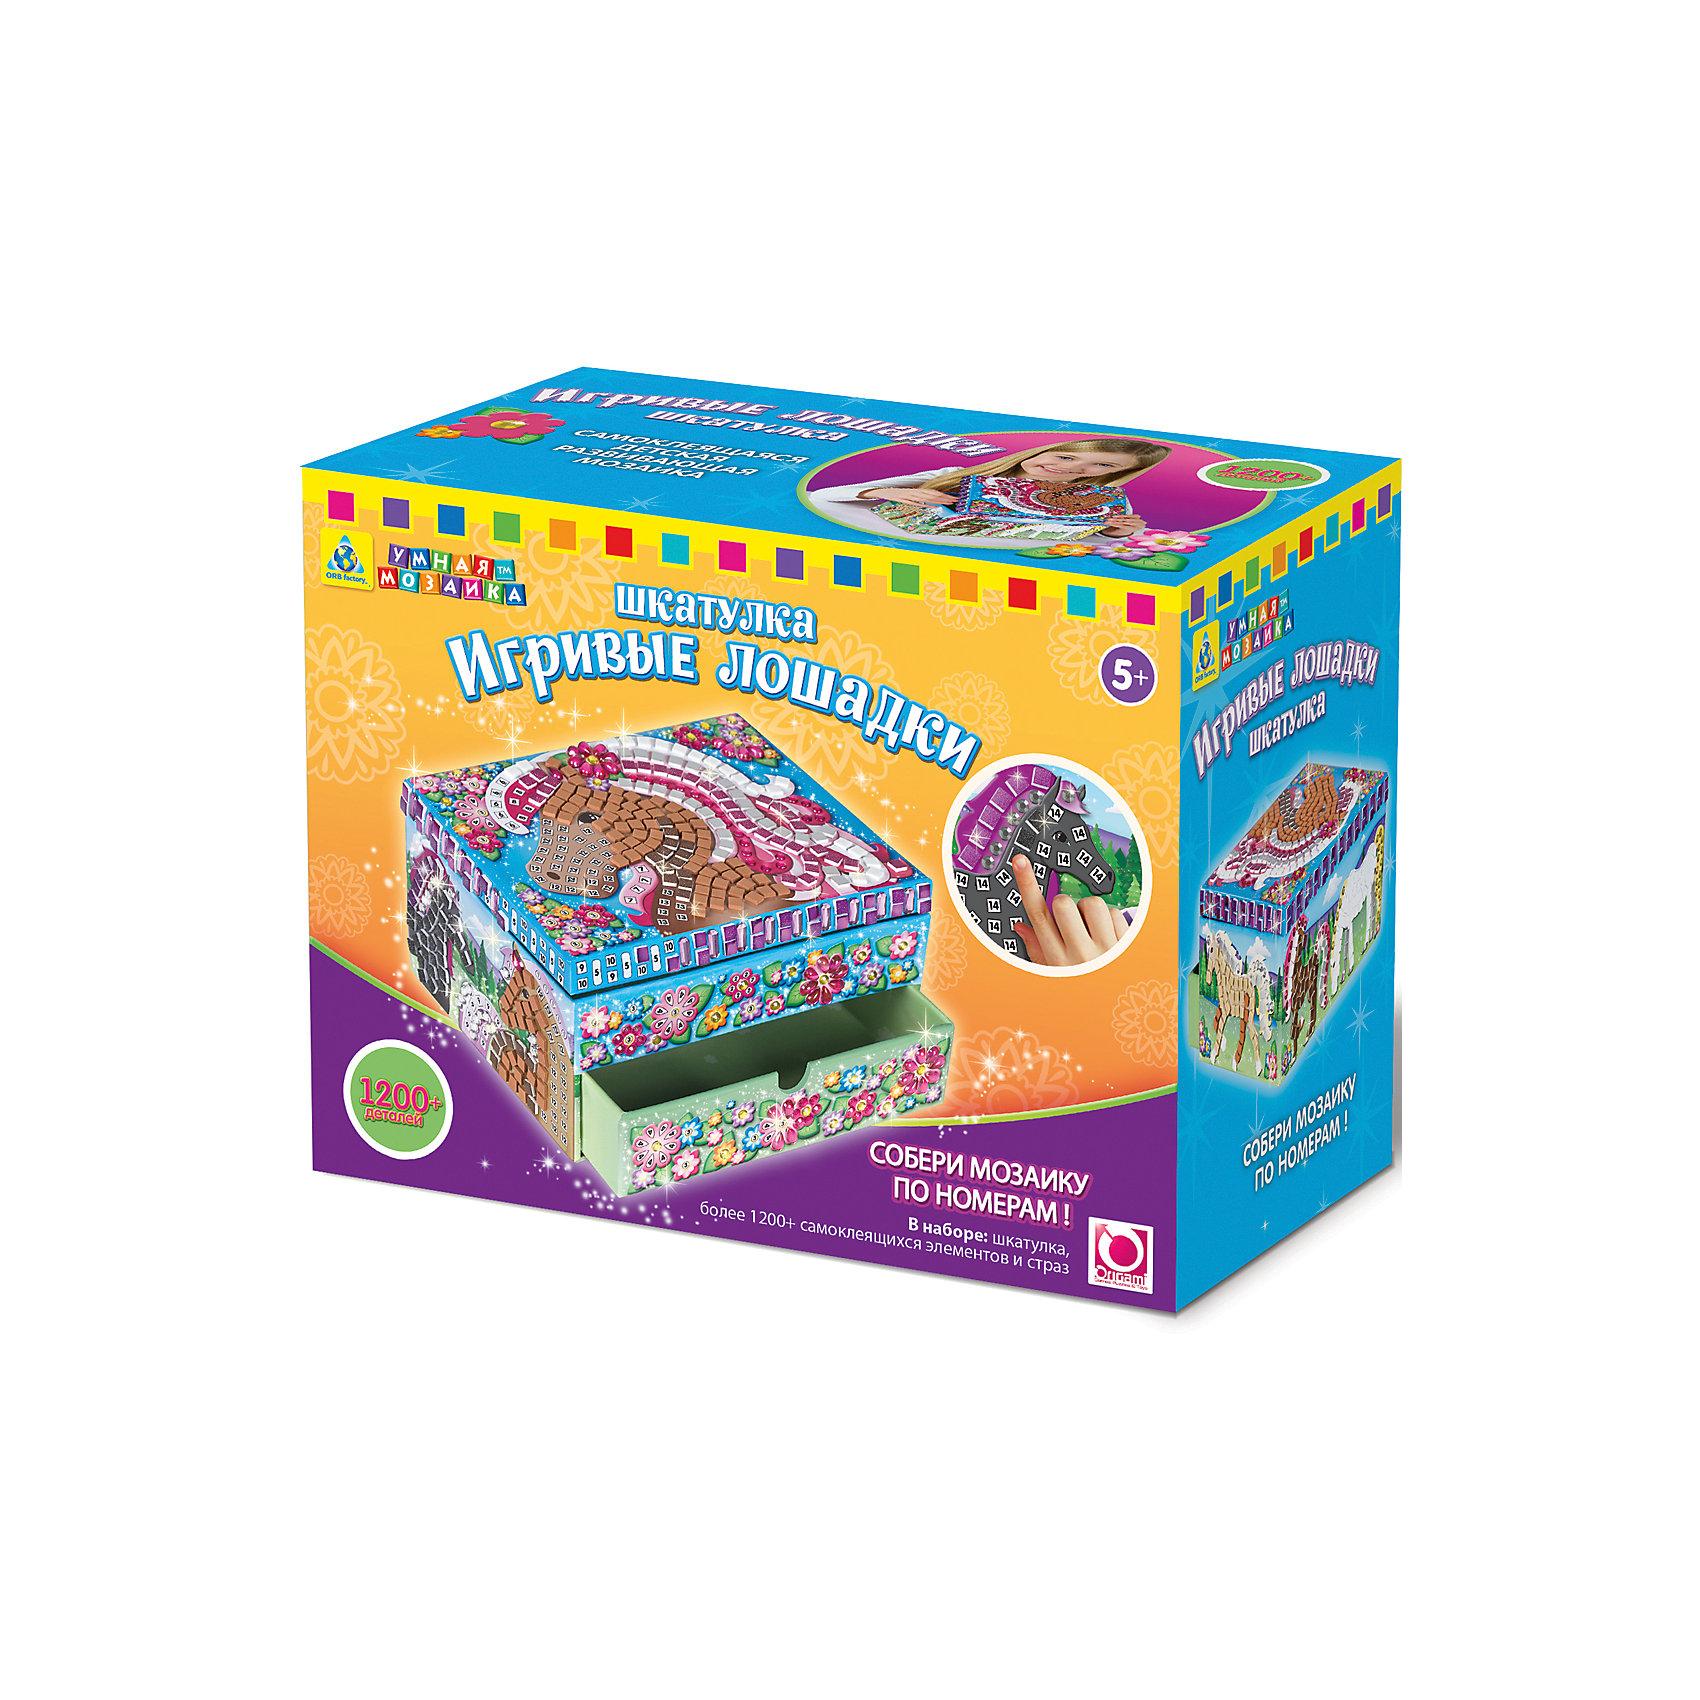 Orb Factory Мозаика-шкатулка Лошадка orb factory мозаика для девочек сверкающие аксессуары